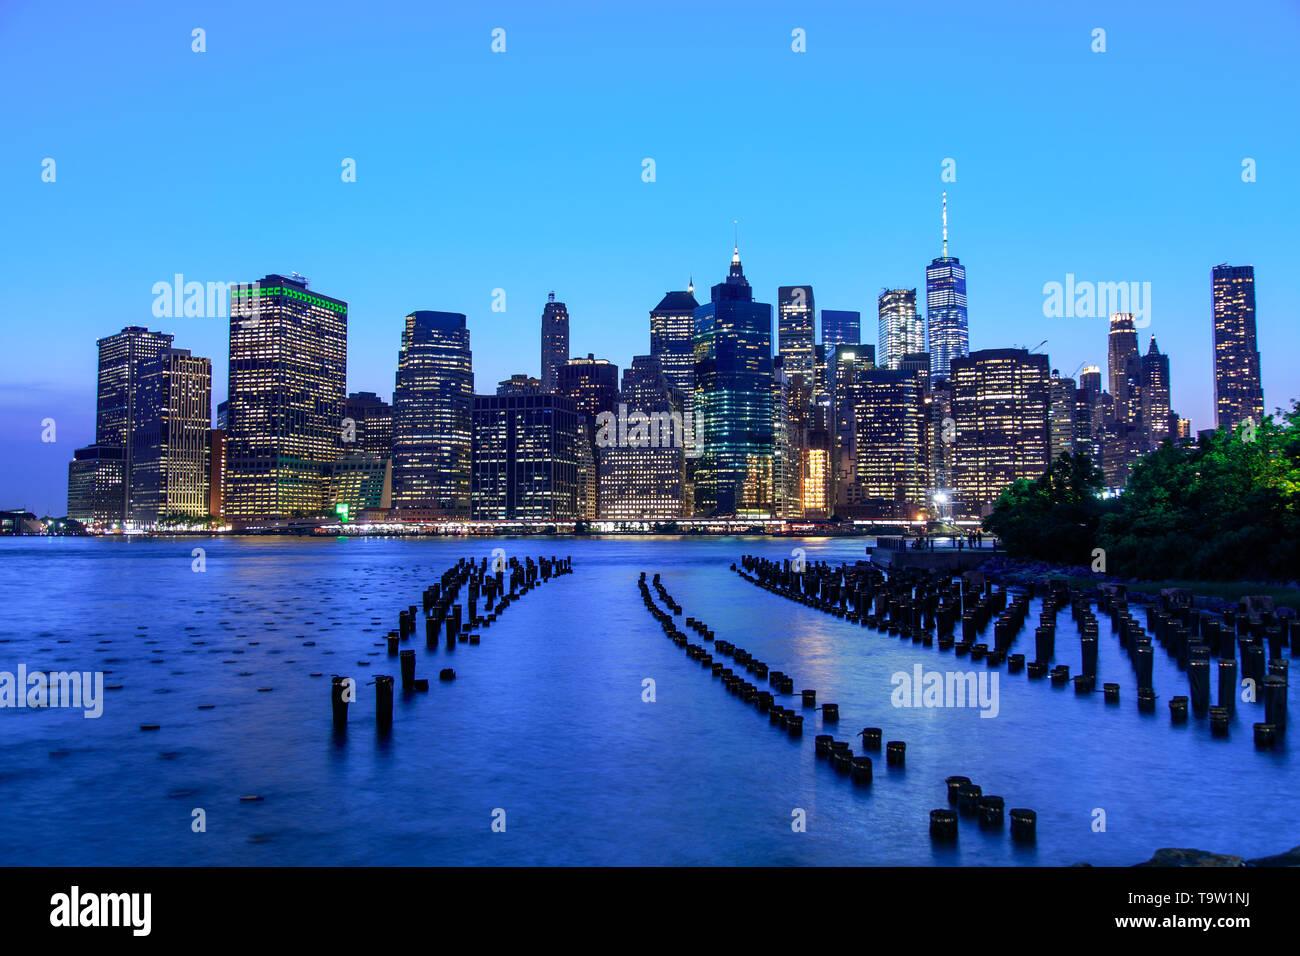 Manhattan panoramic skyline at night from Brooklyn Bridge Park. New York City - Stock Image